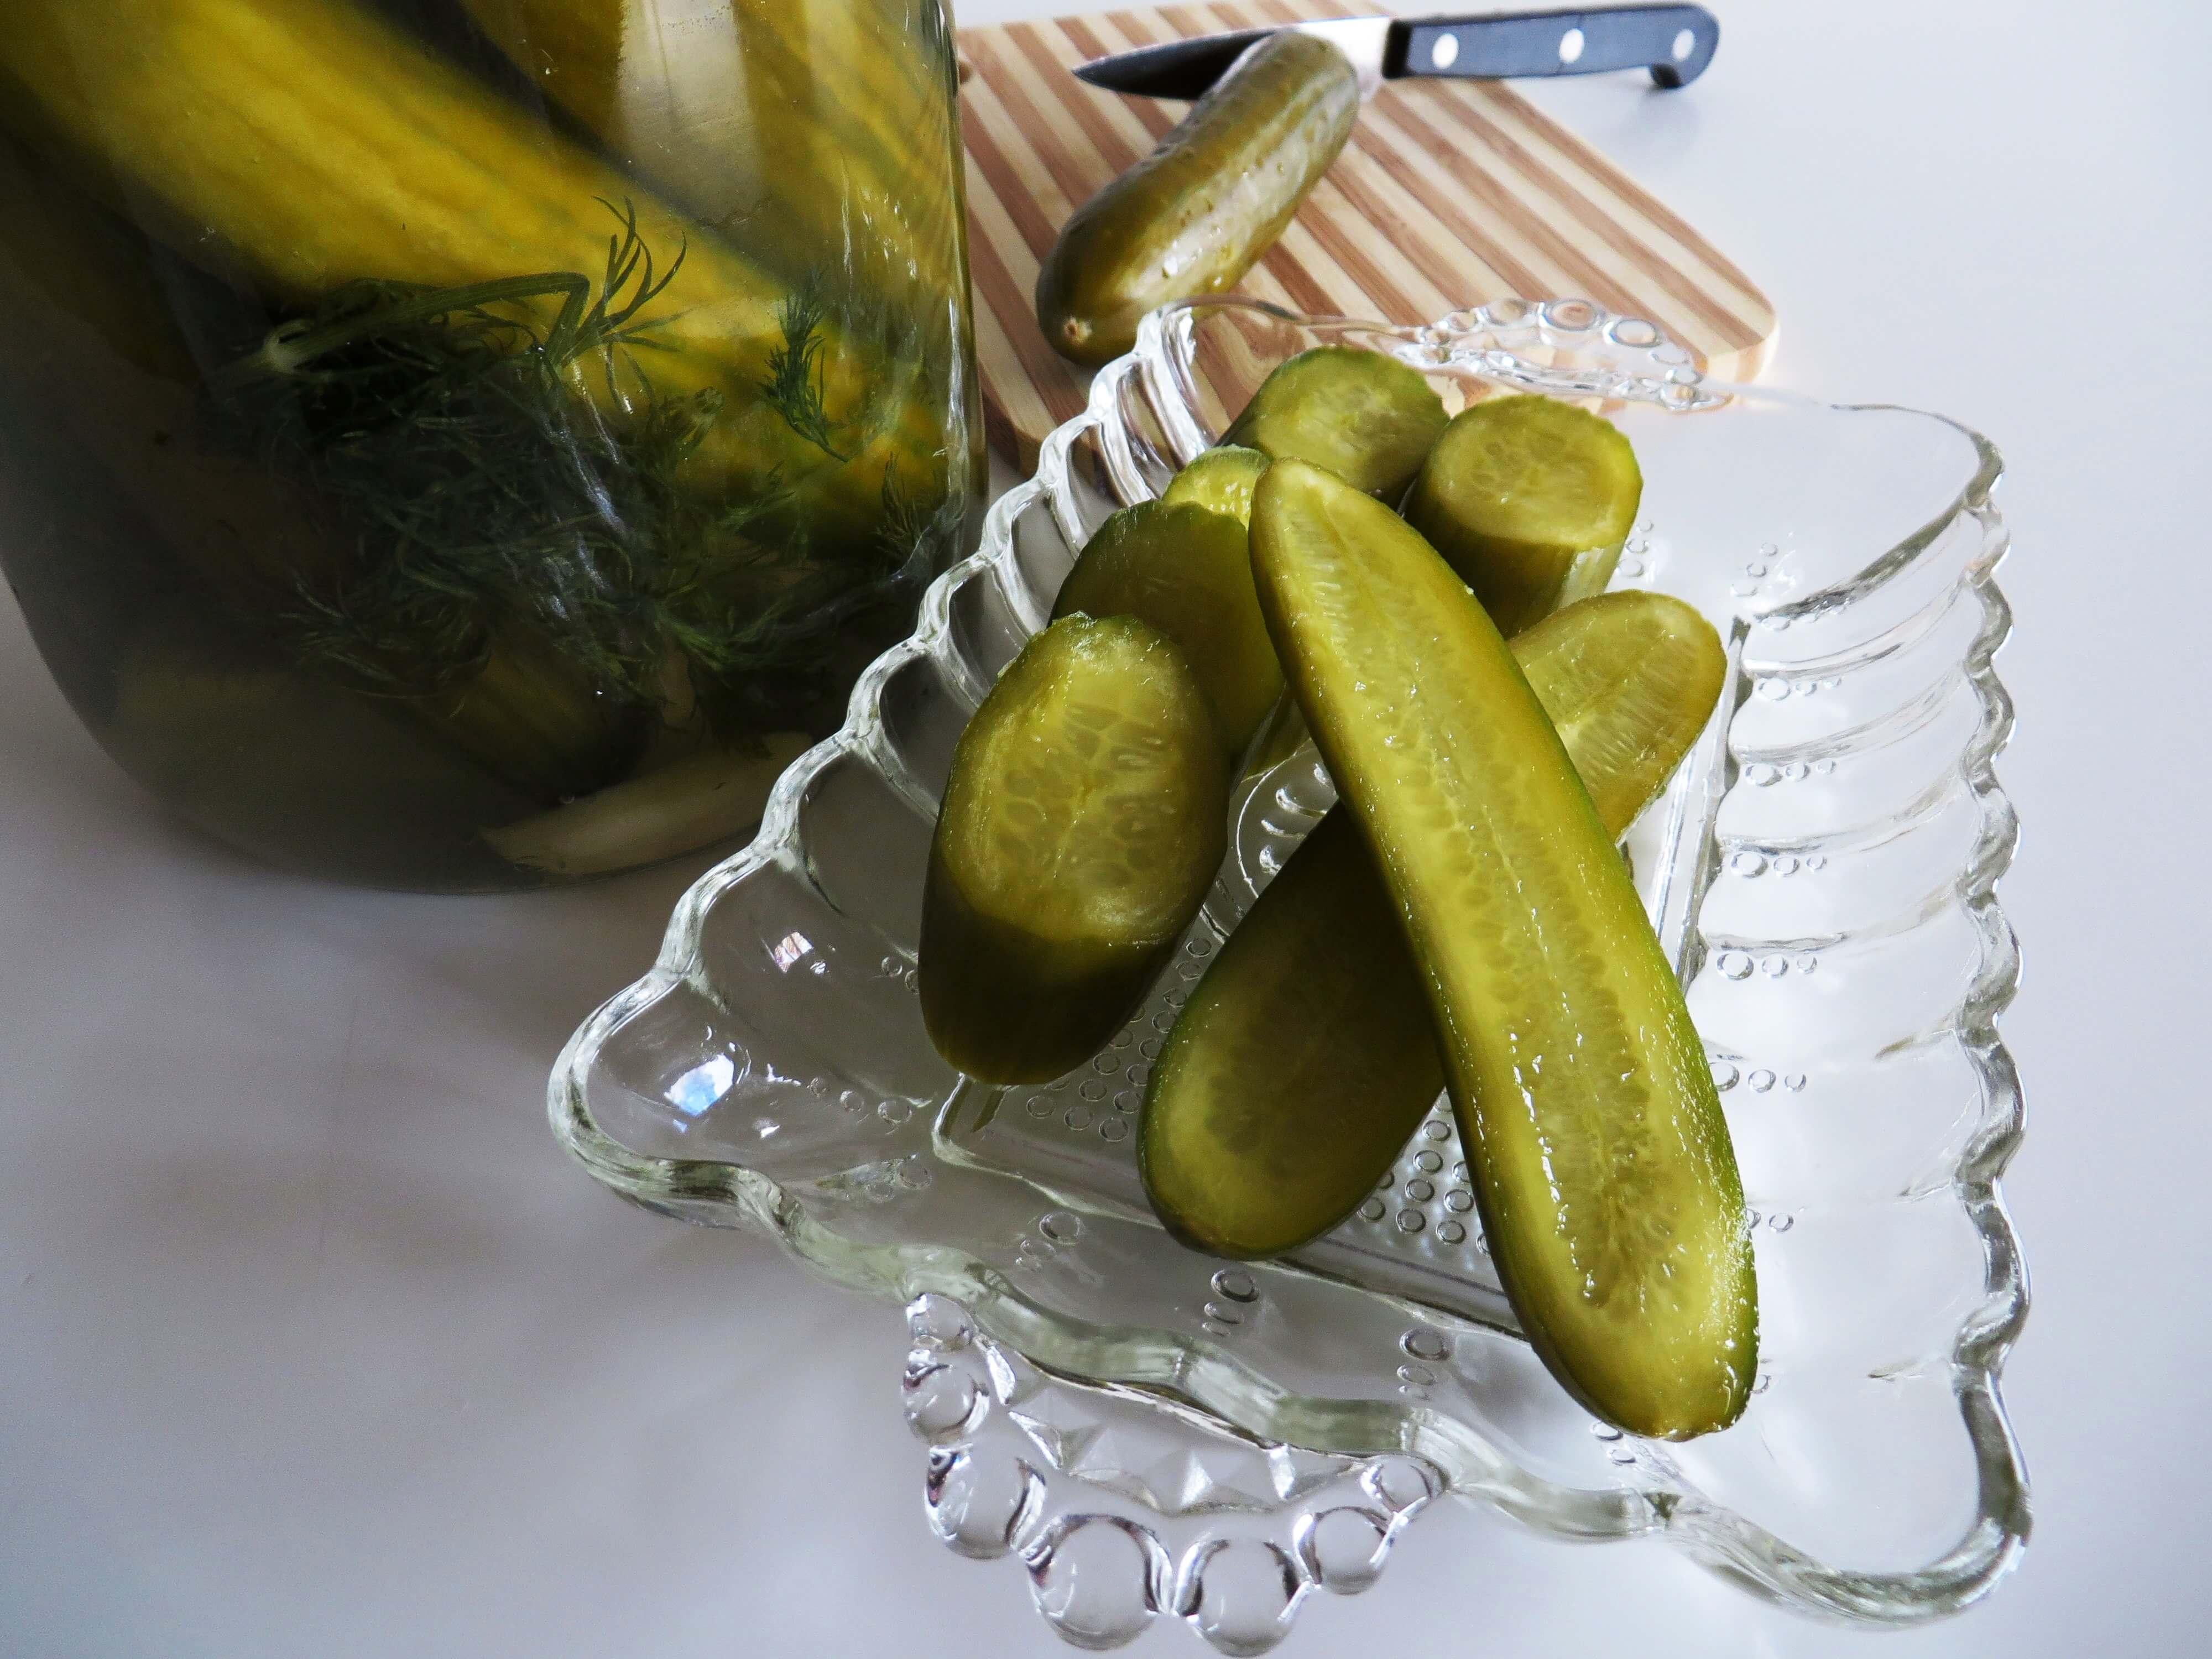 Persian pickles |Cucumber in brine Khiar Shour خیار شور | Mixed Vegetables in Brine Makhlut Shour مخلوط شور |Fae